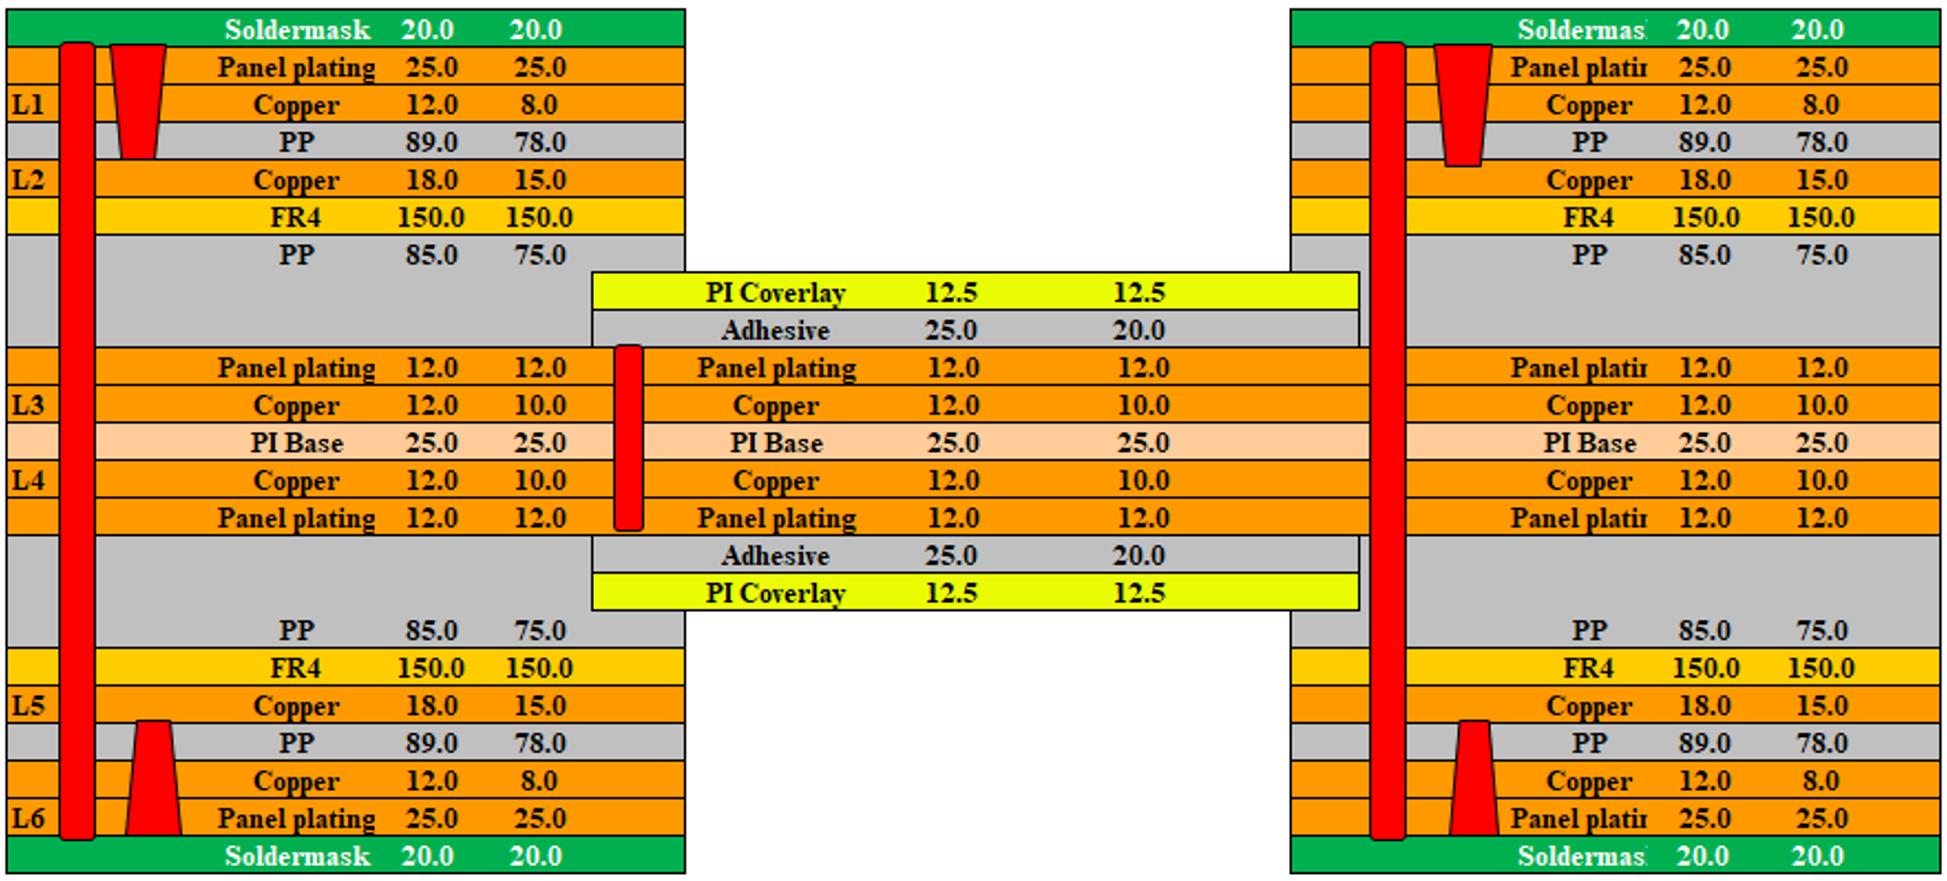 08 Lamination structure rigid flex PCB - Rigid flex PCB - 6L HDI rigid-flex boards